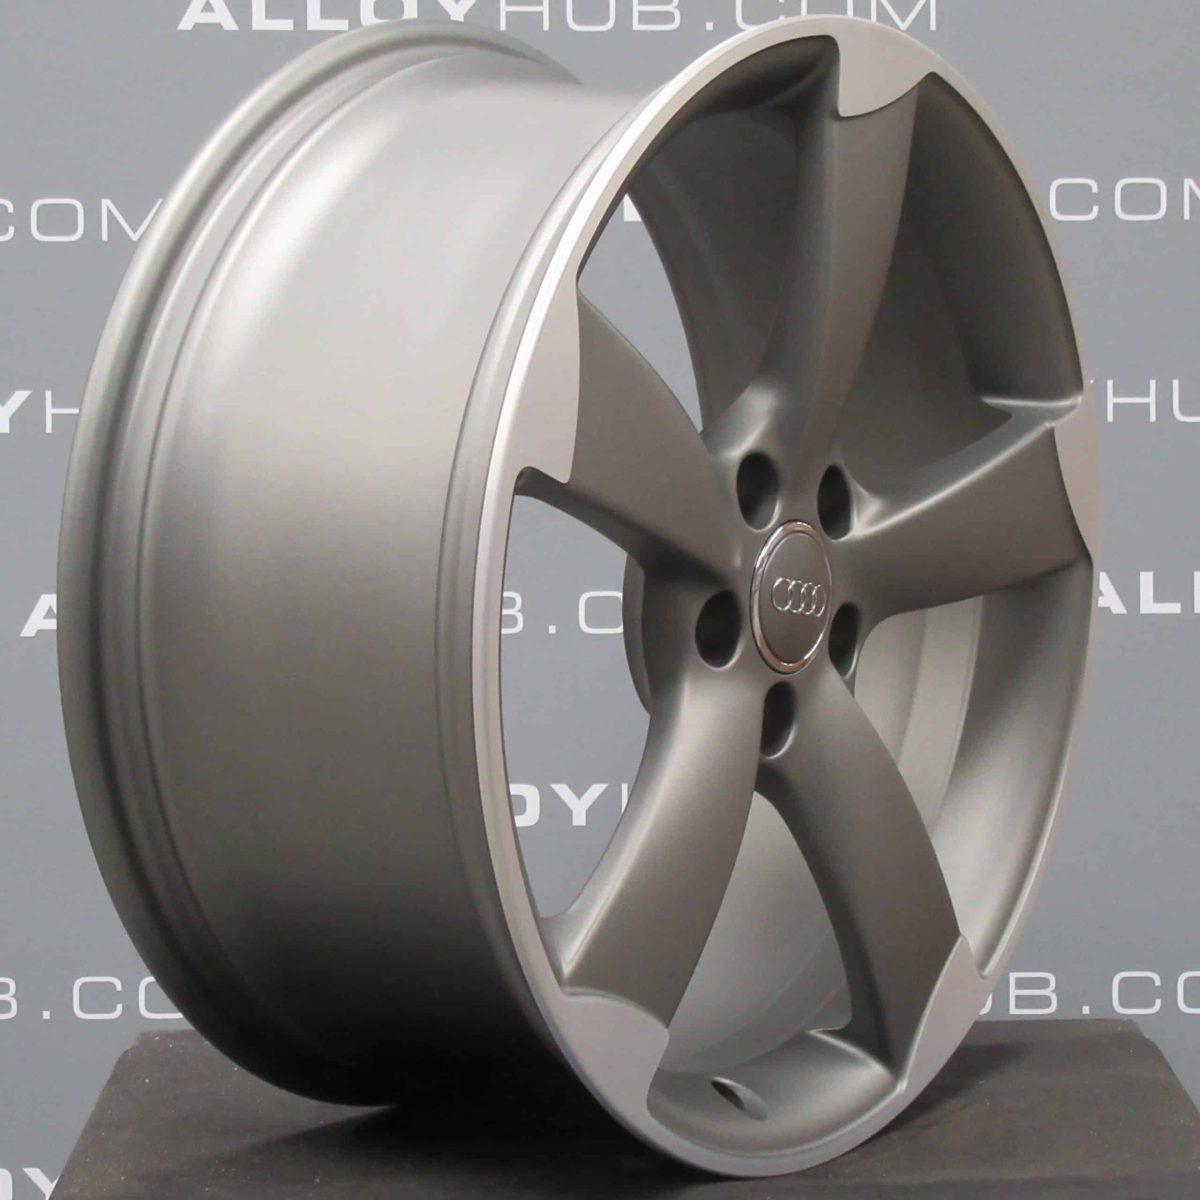 "Genuine Audi A1 8 x Rotor Arm S-Line Black Edition 18"" Inch Alloy Wheels with Grey & Diamond Turned Finish 8X0 601 025 AR"